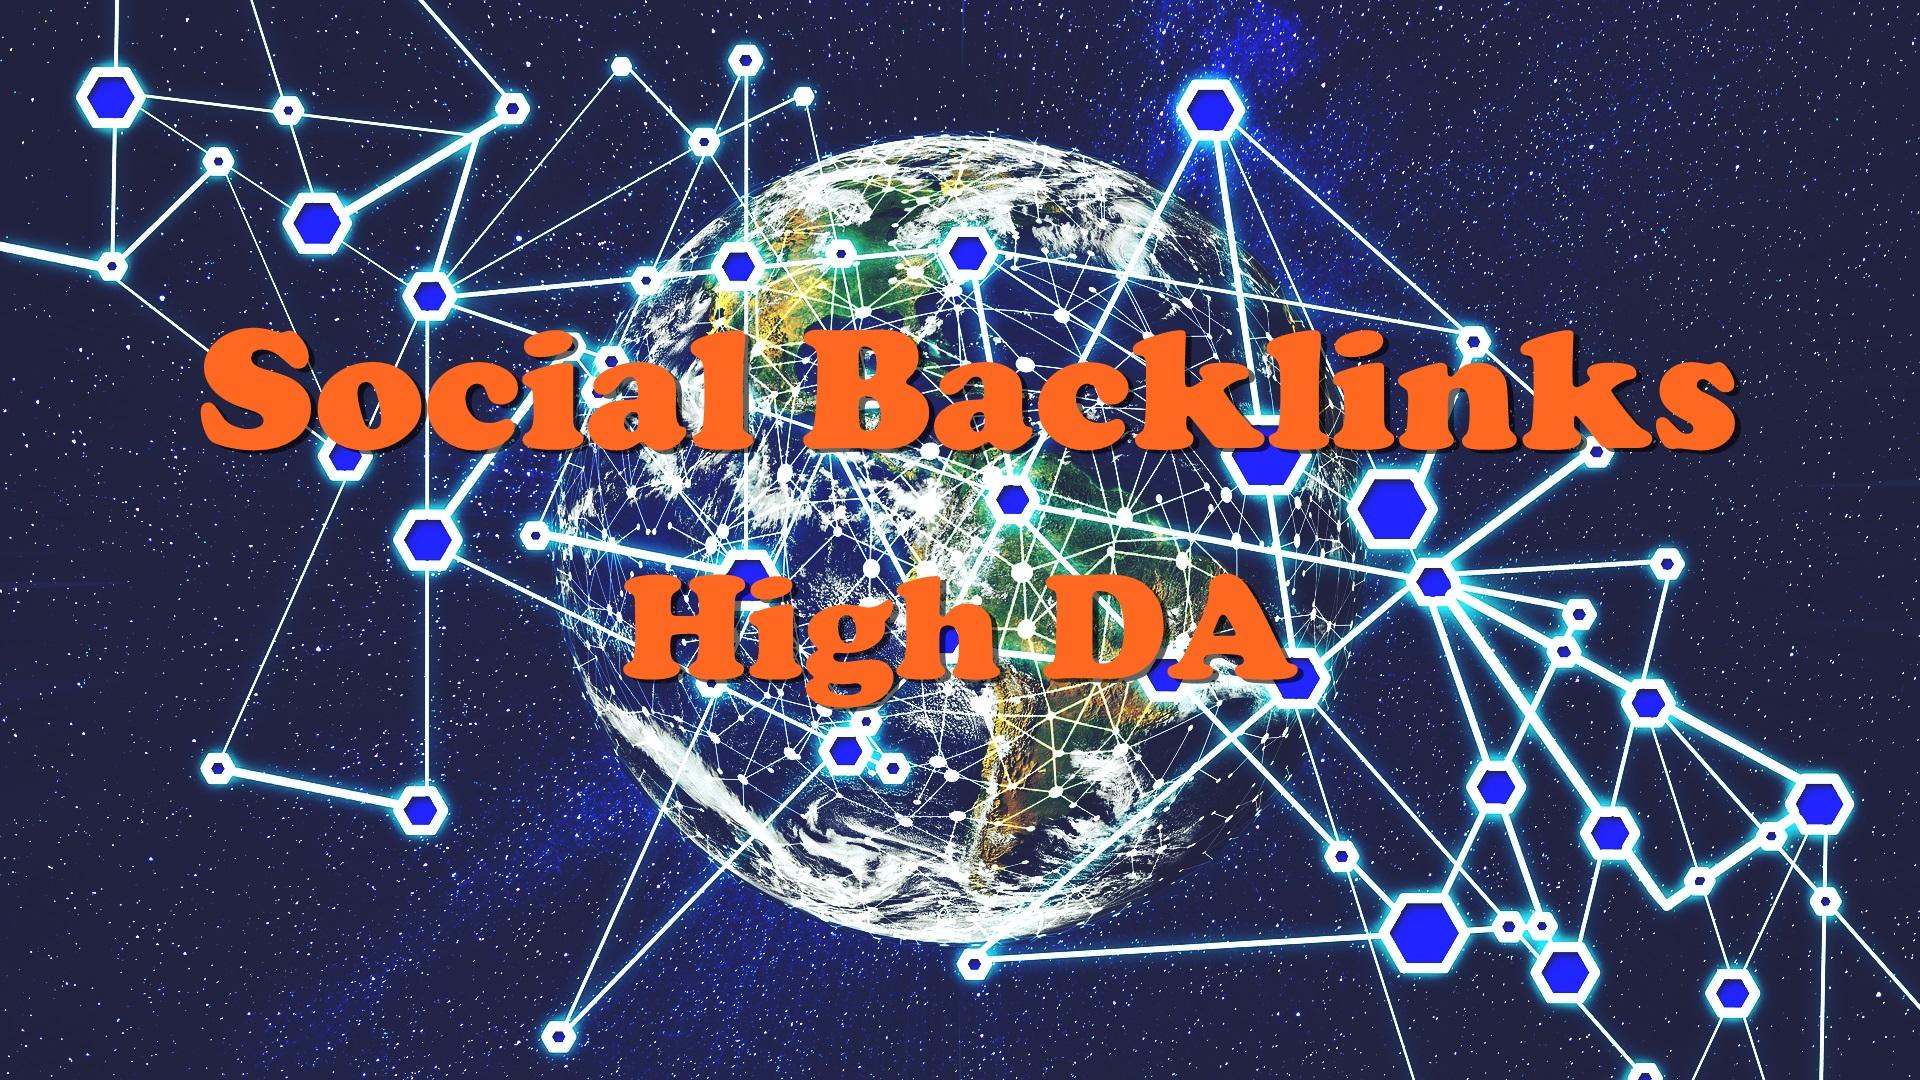 Manual 20 Social Backlinks High DA and Dofollow